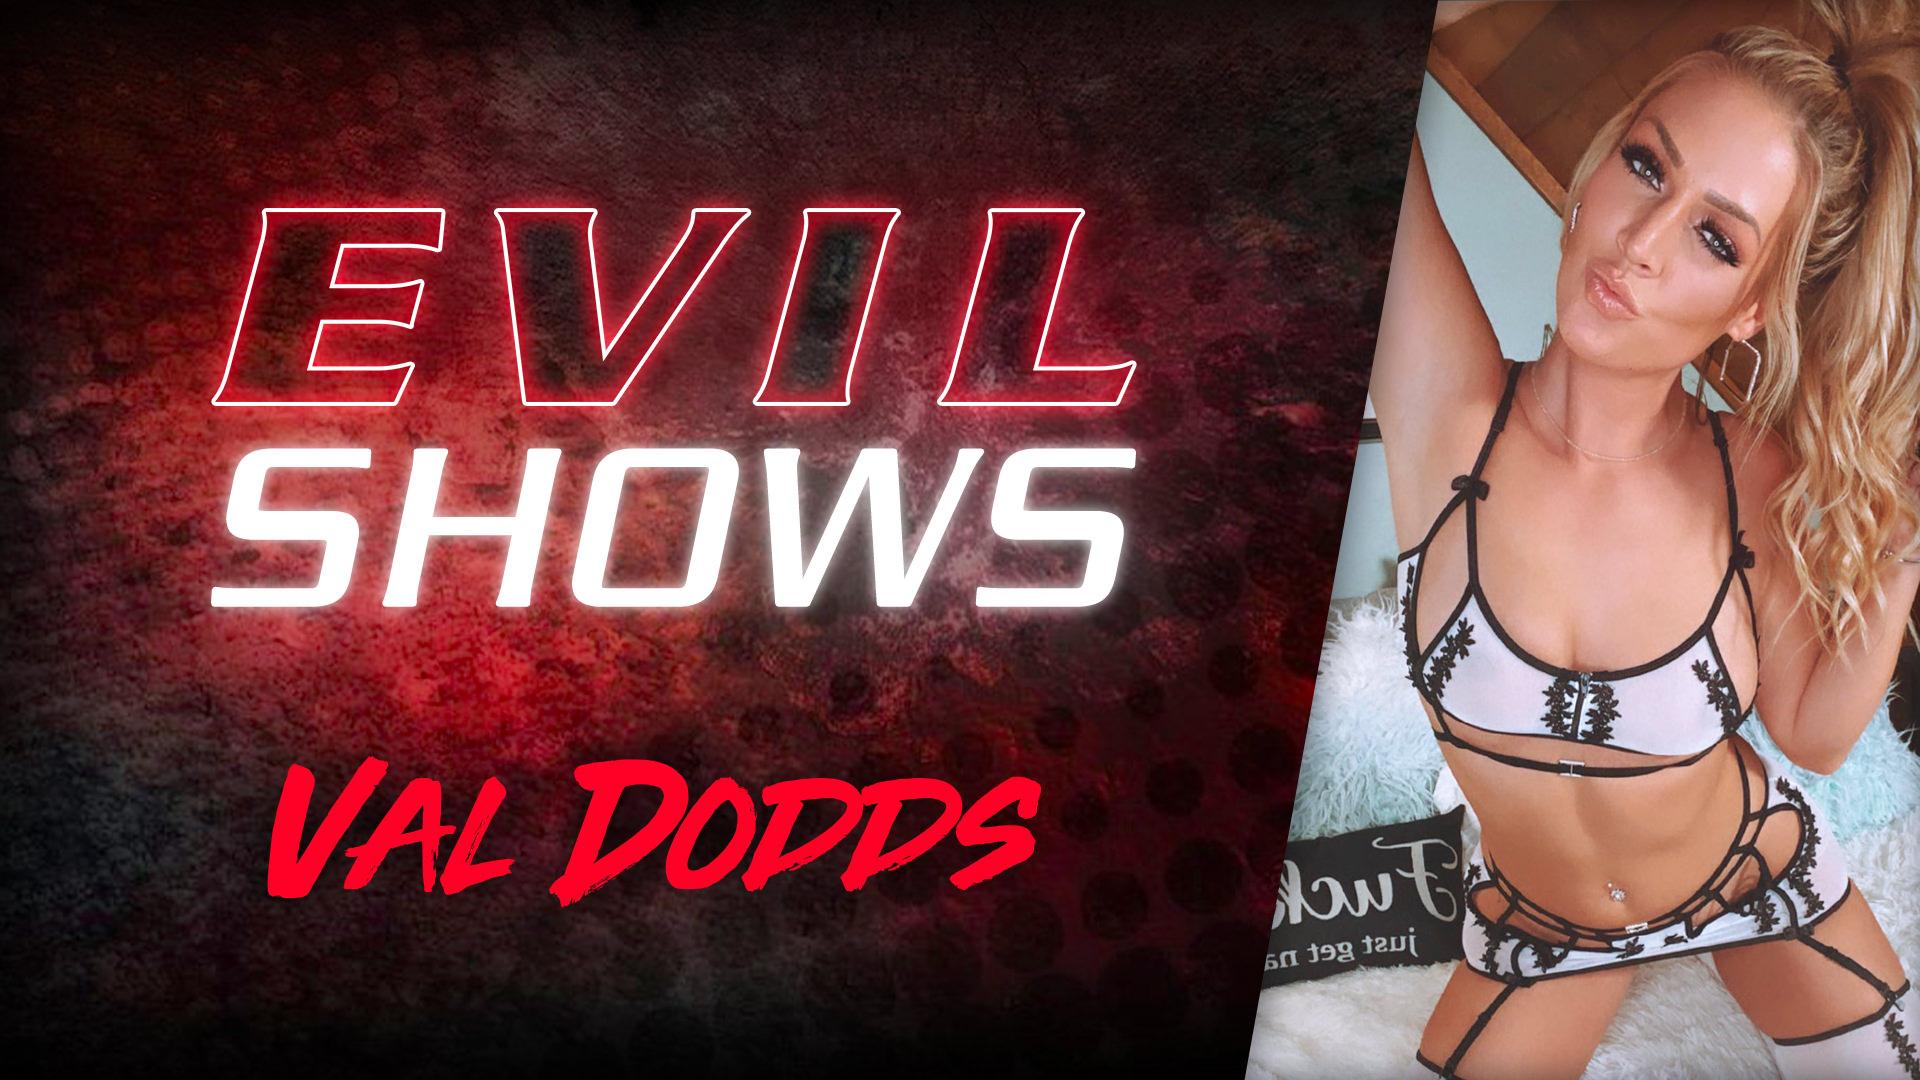 Evil Shows - Val Dodds Escena 1